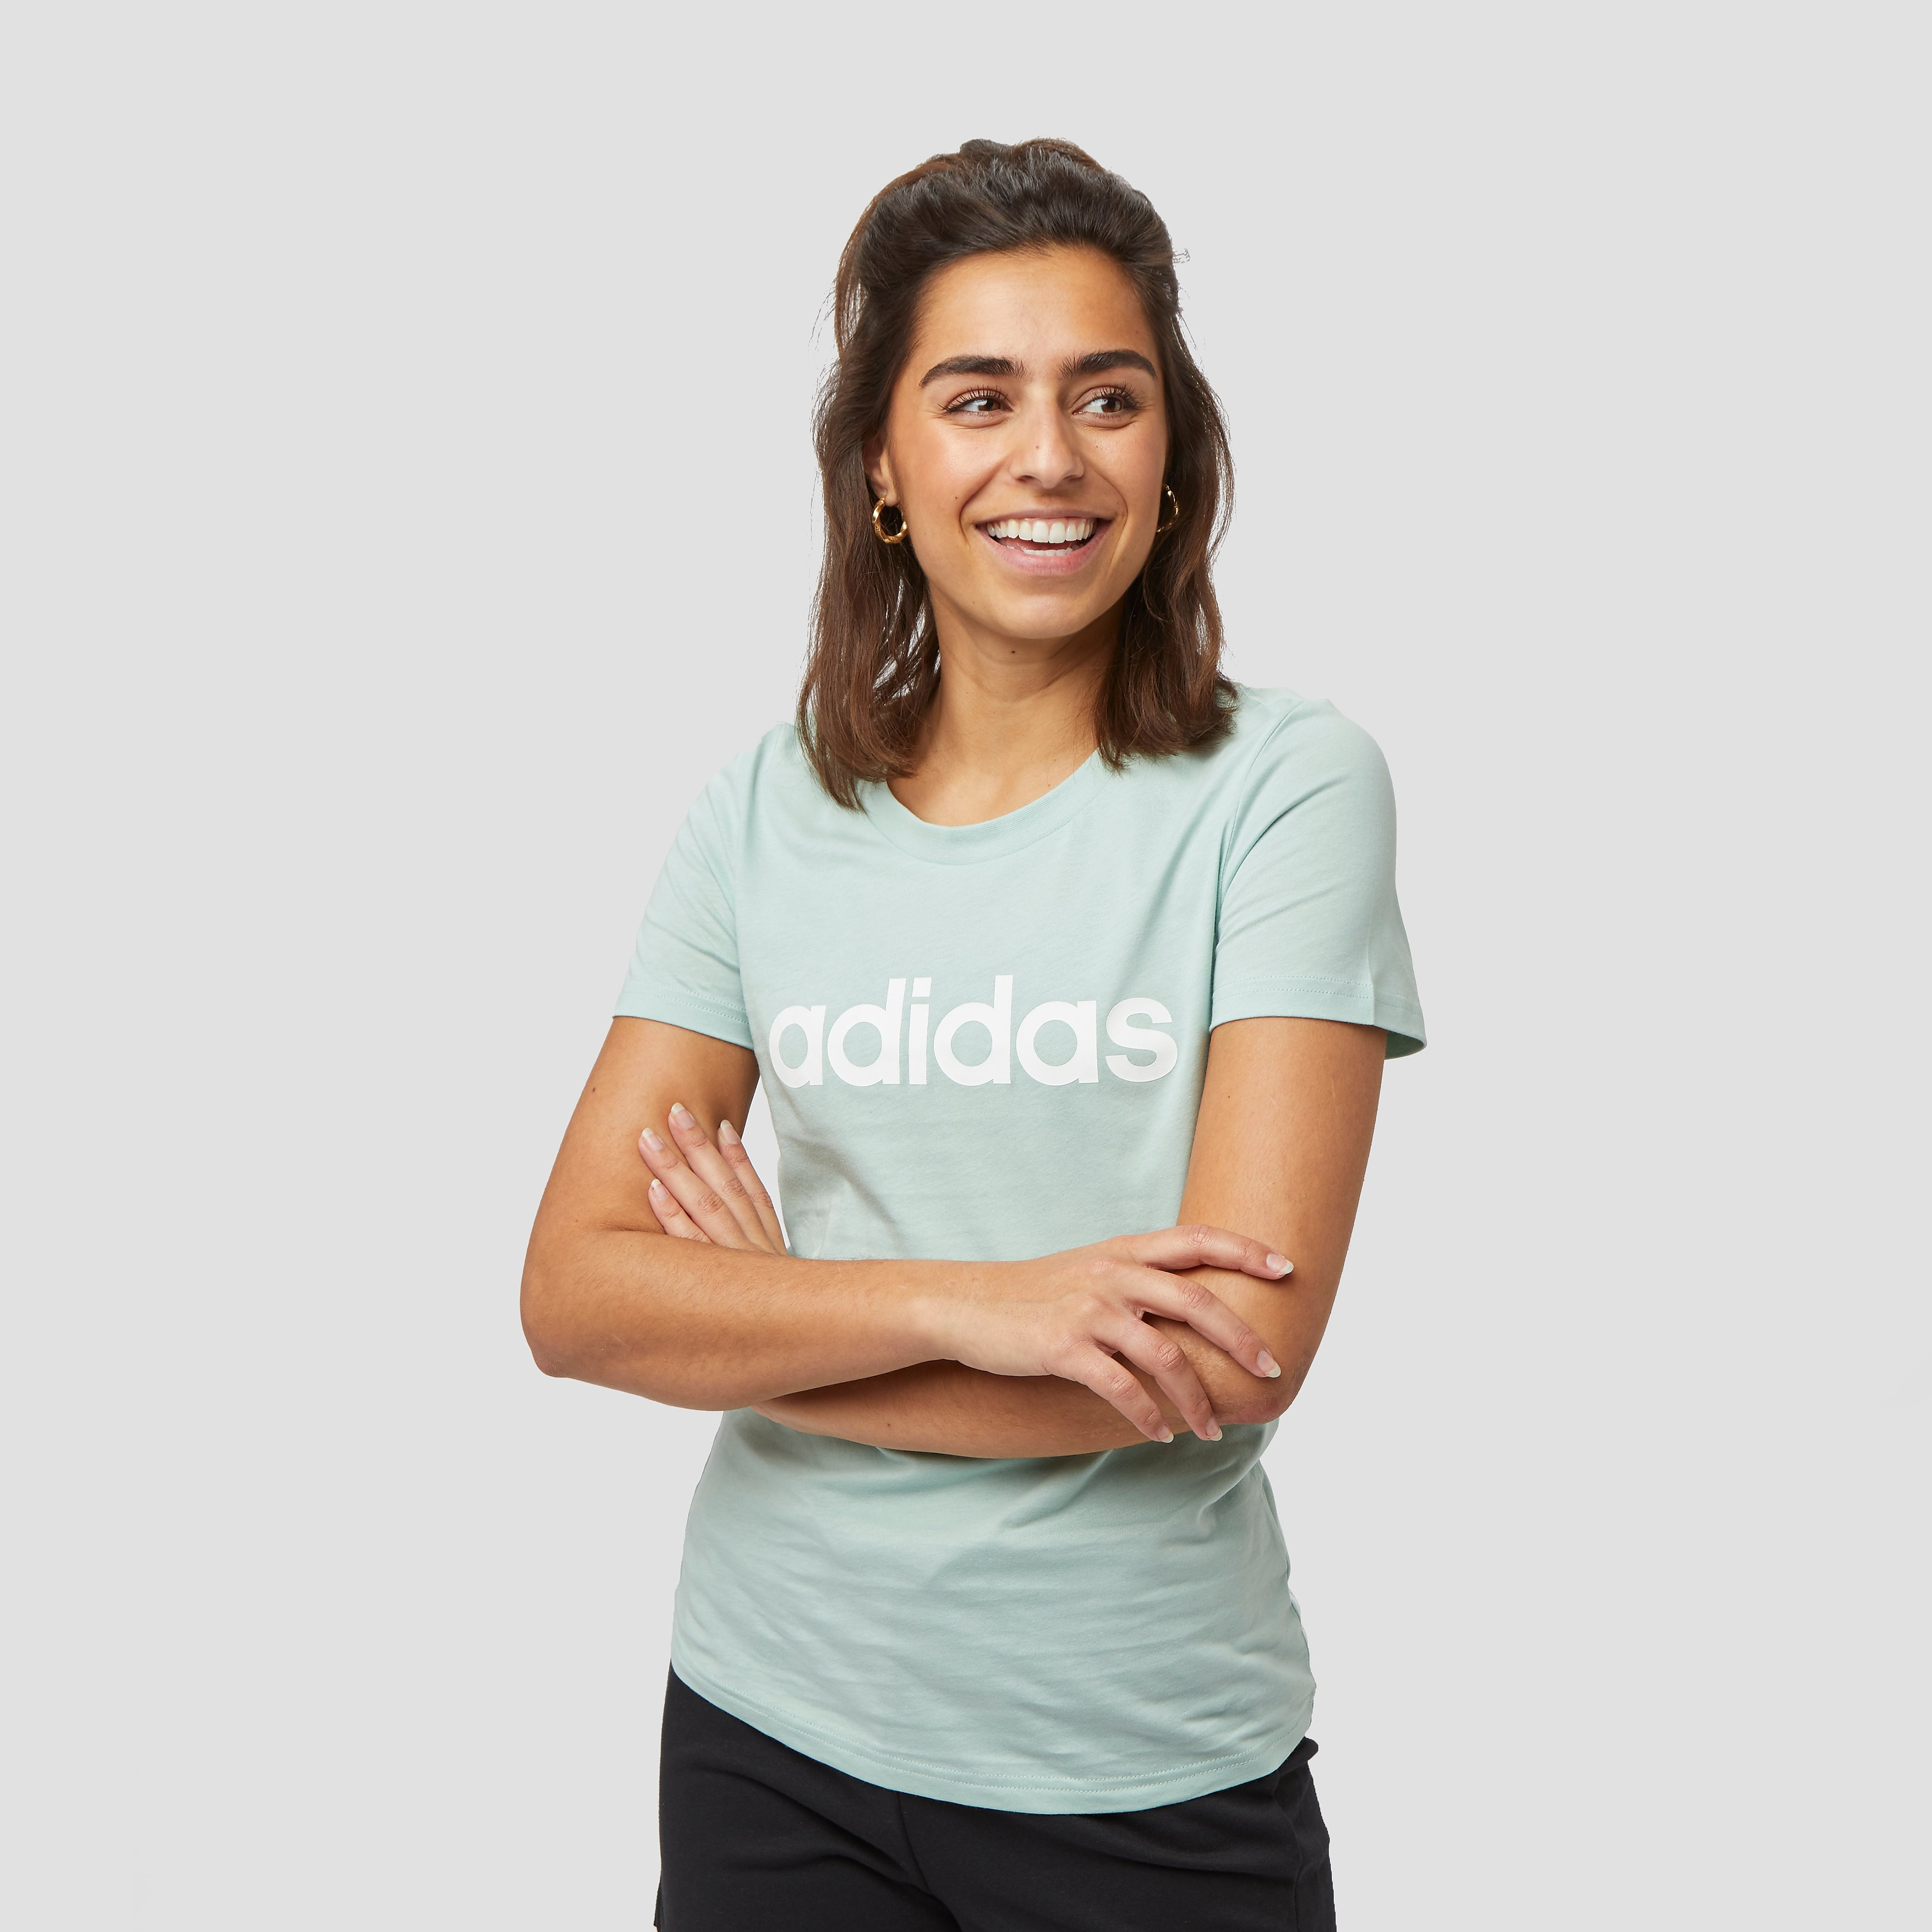 adidas Linear slim shirt groen dames Dames Gymnastiekwinkel.nl